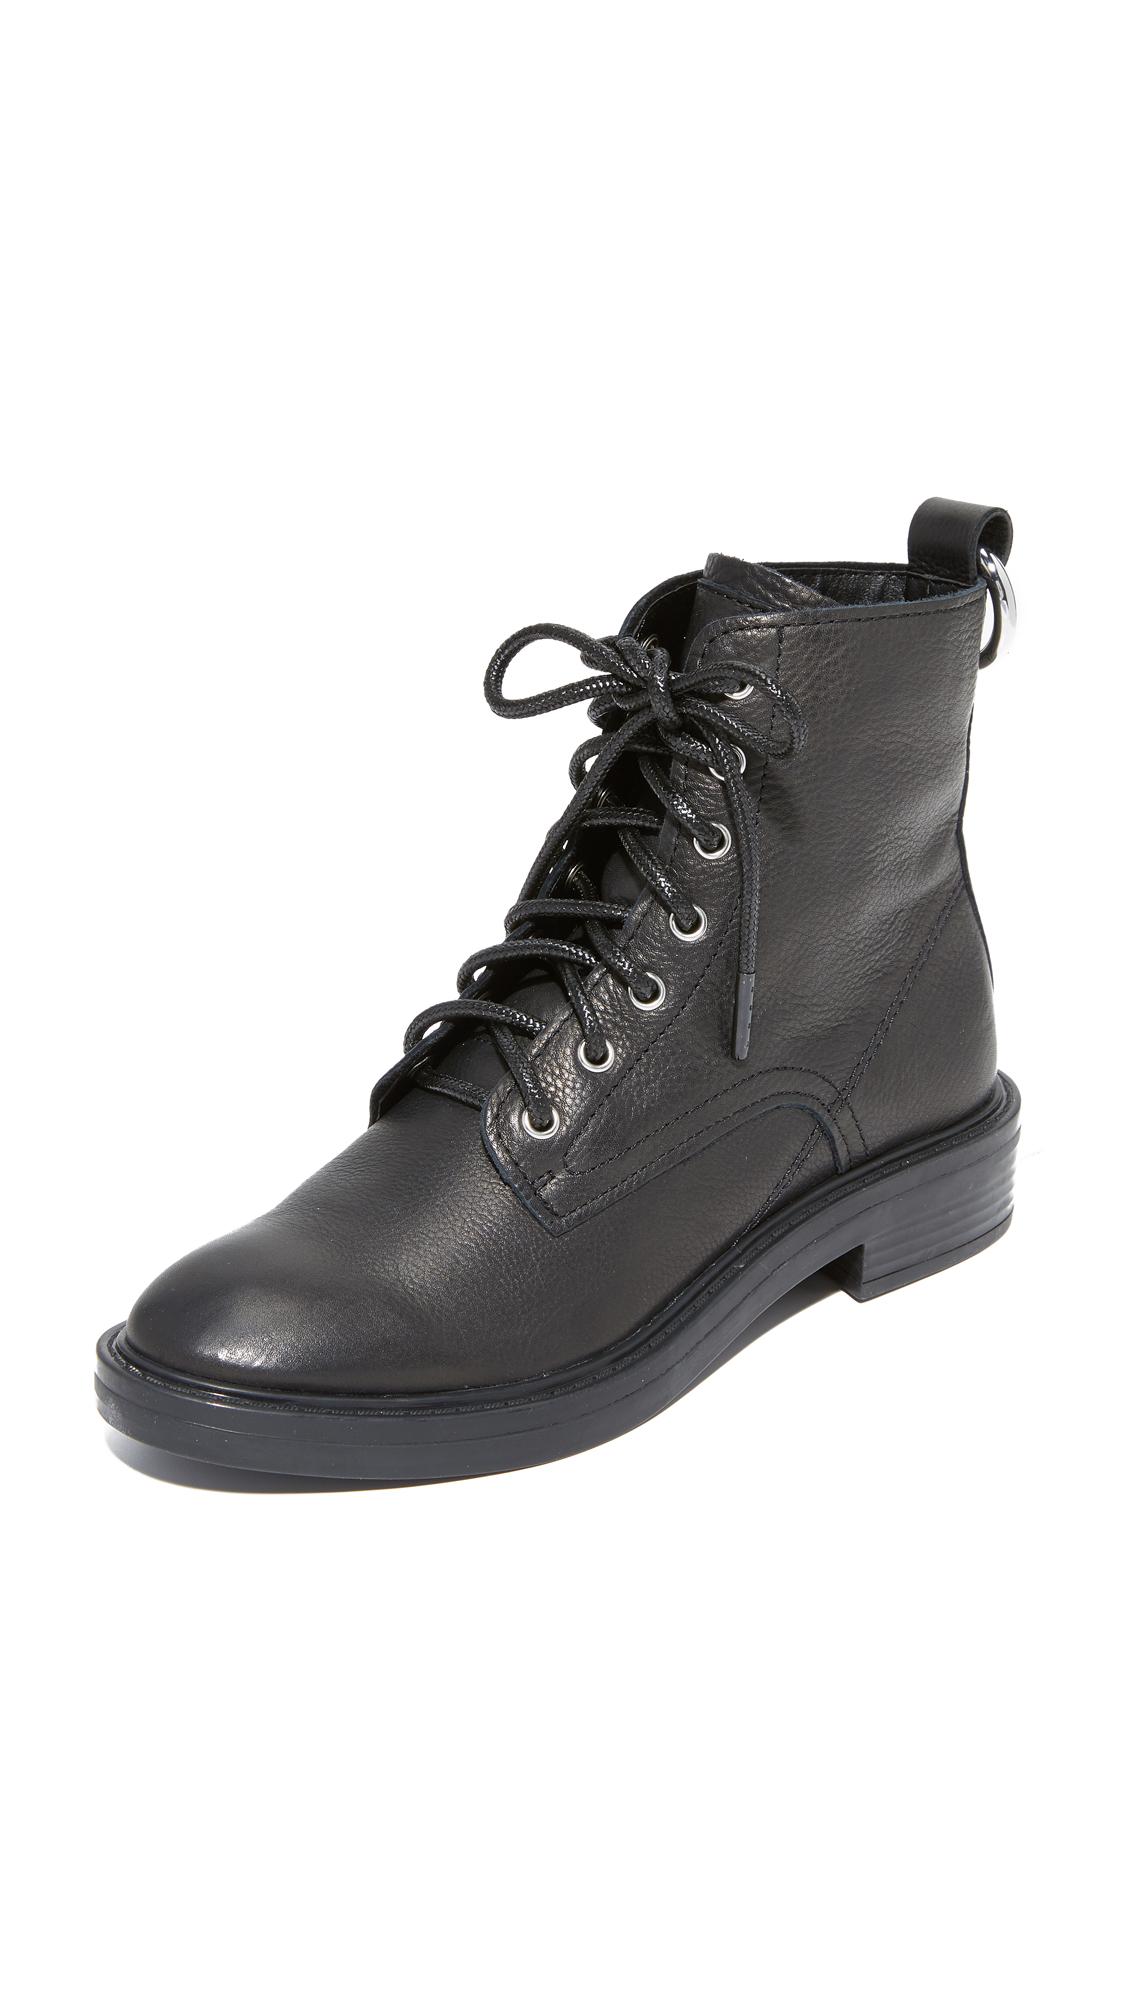 Dolce Vita Bardot Combat Boots - Black